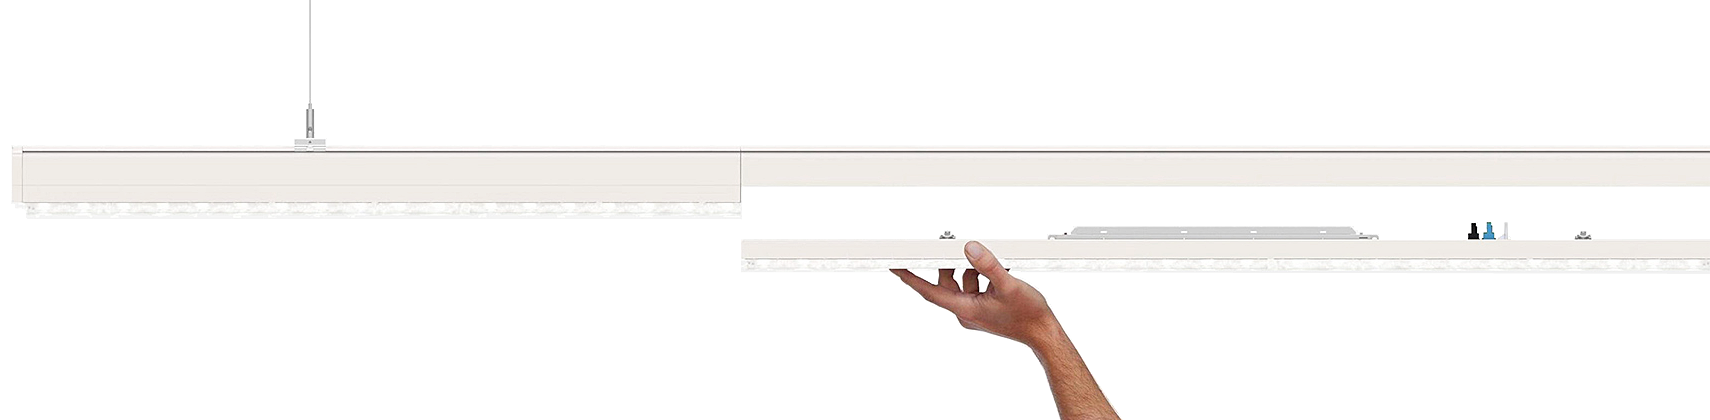 LED-Lichtband-Komplettsystem LSL-06 Montage